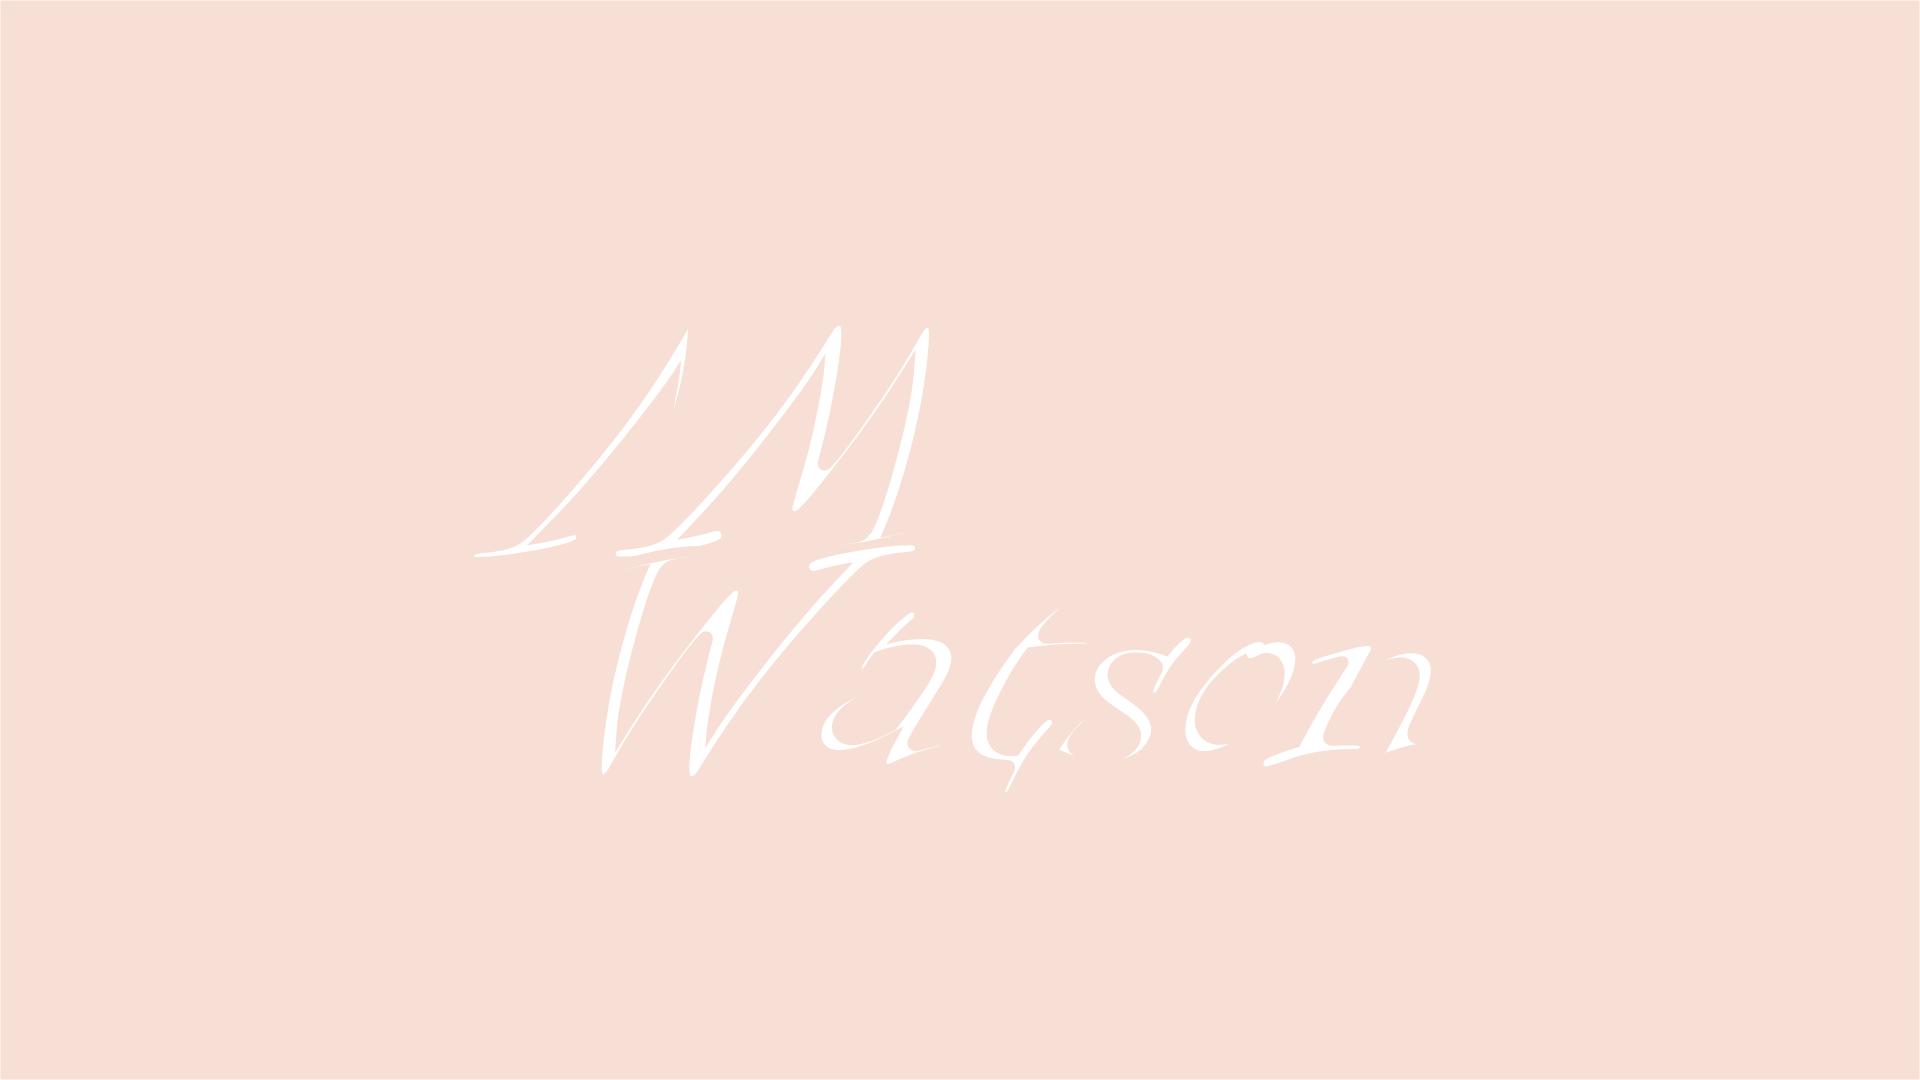 Разработать логотип для балетного бренда фото f_5855bc3205fbe303.png